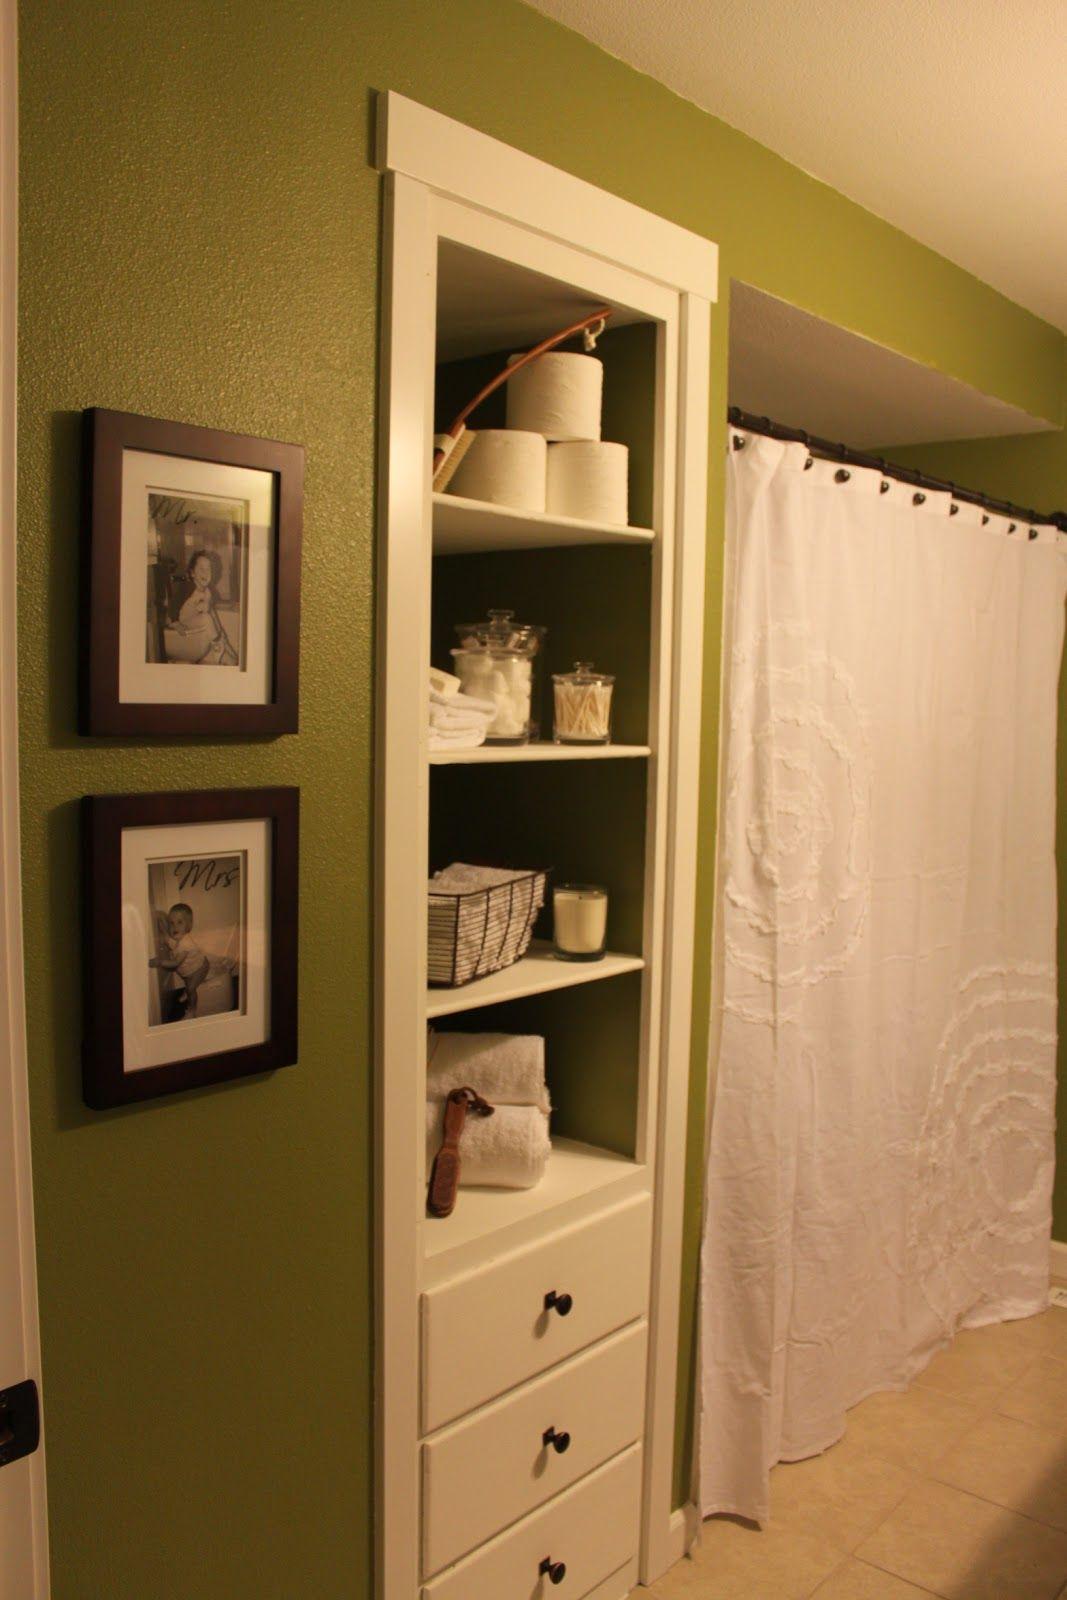 Behr grape leaves green and white bathroom. White shower curtain ...